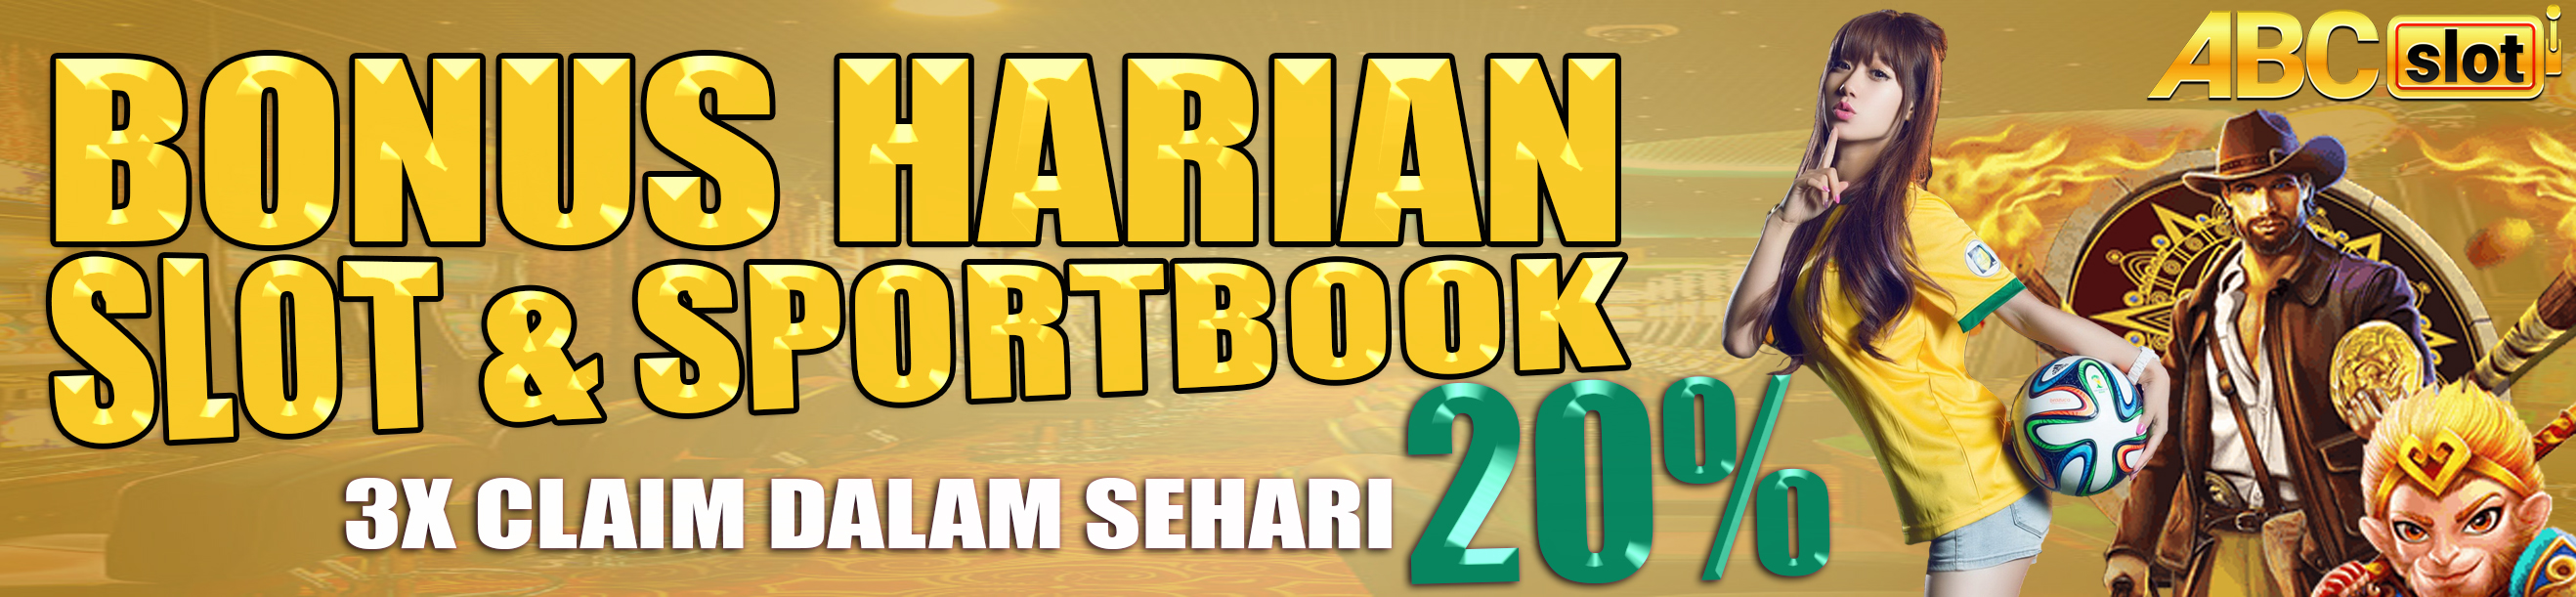 BONUS HARIAN 20%, DAPAT DI CLAIM 3X DALAM SEHARI !